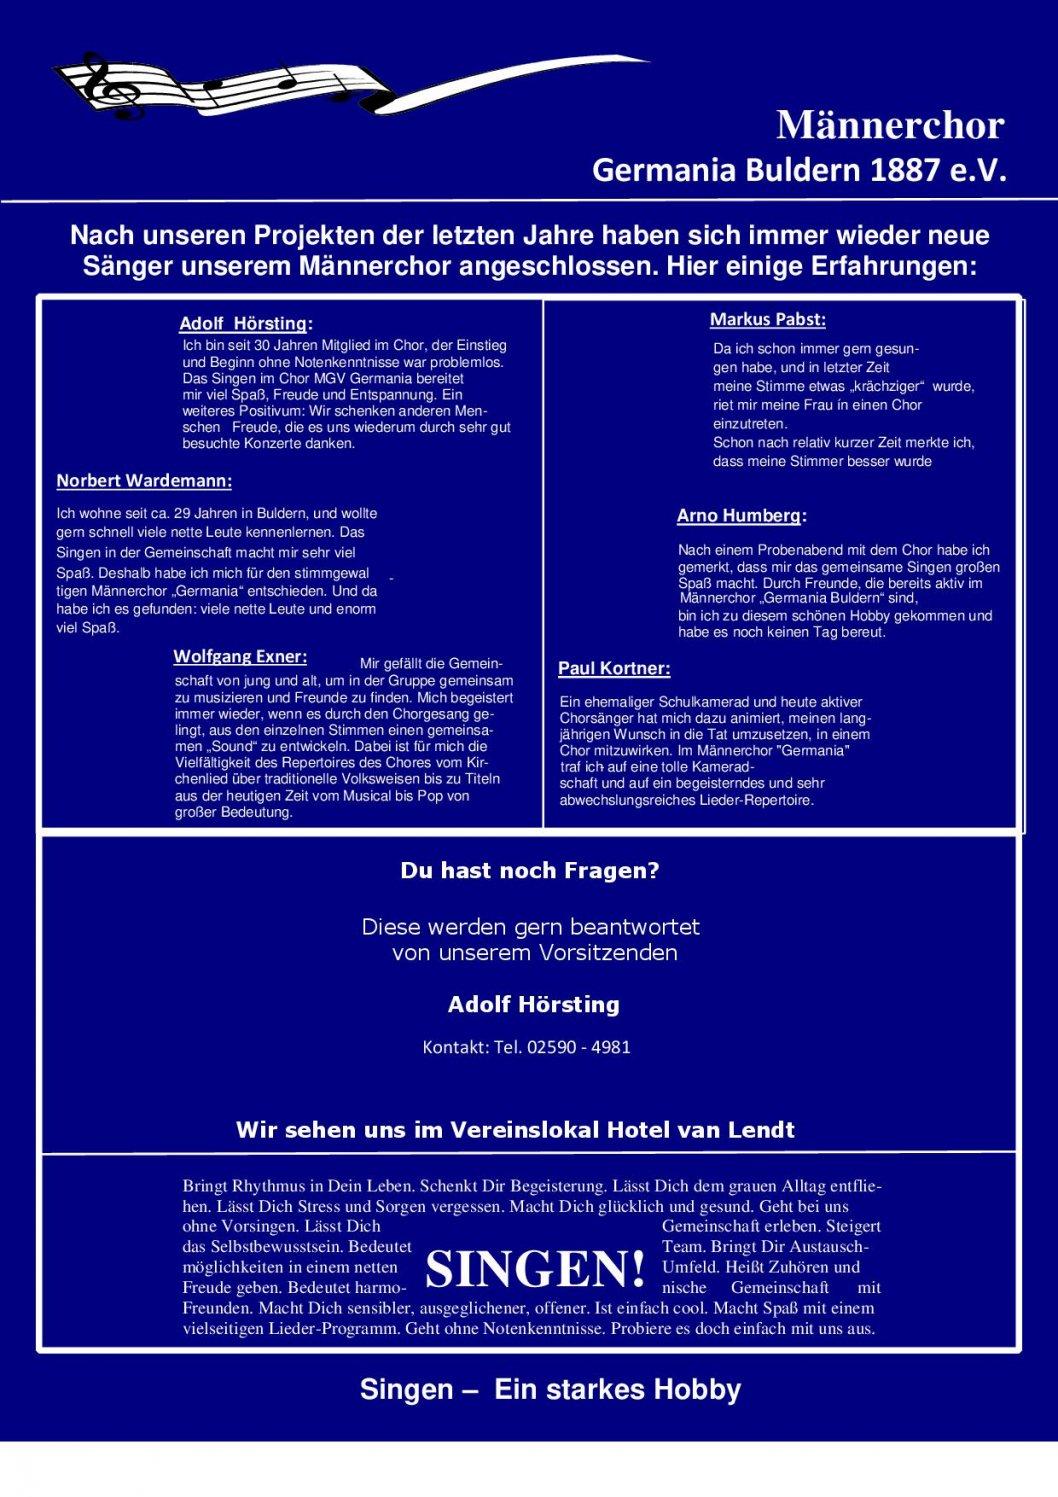 Werbung-Seite-2-Germania-Buldern-Korrektur_2.jpg